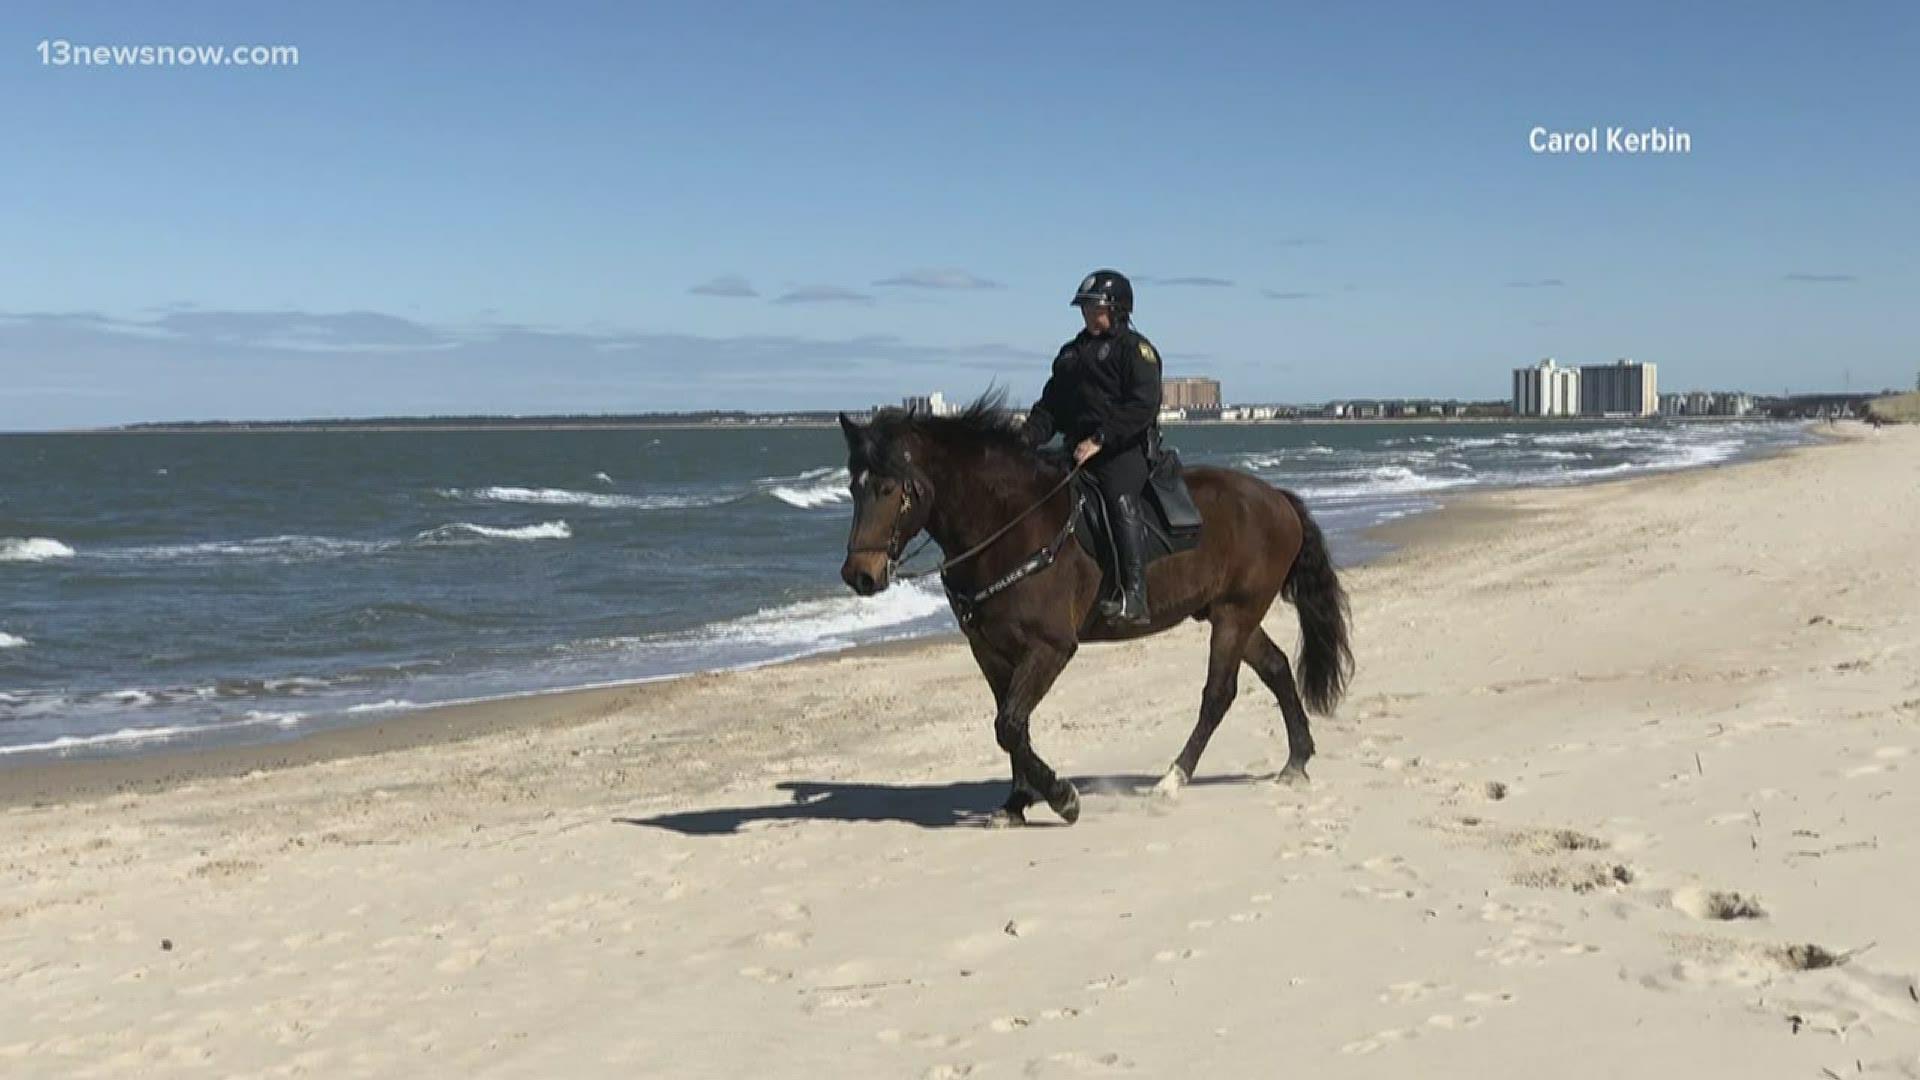 Virginia Beach Police Handed Out 2